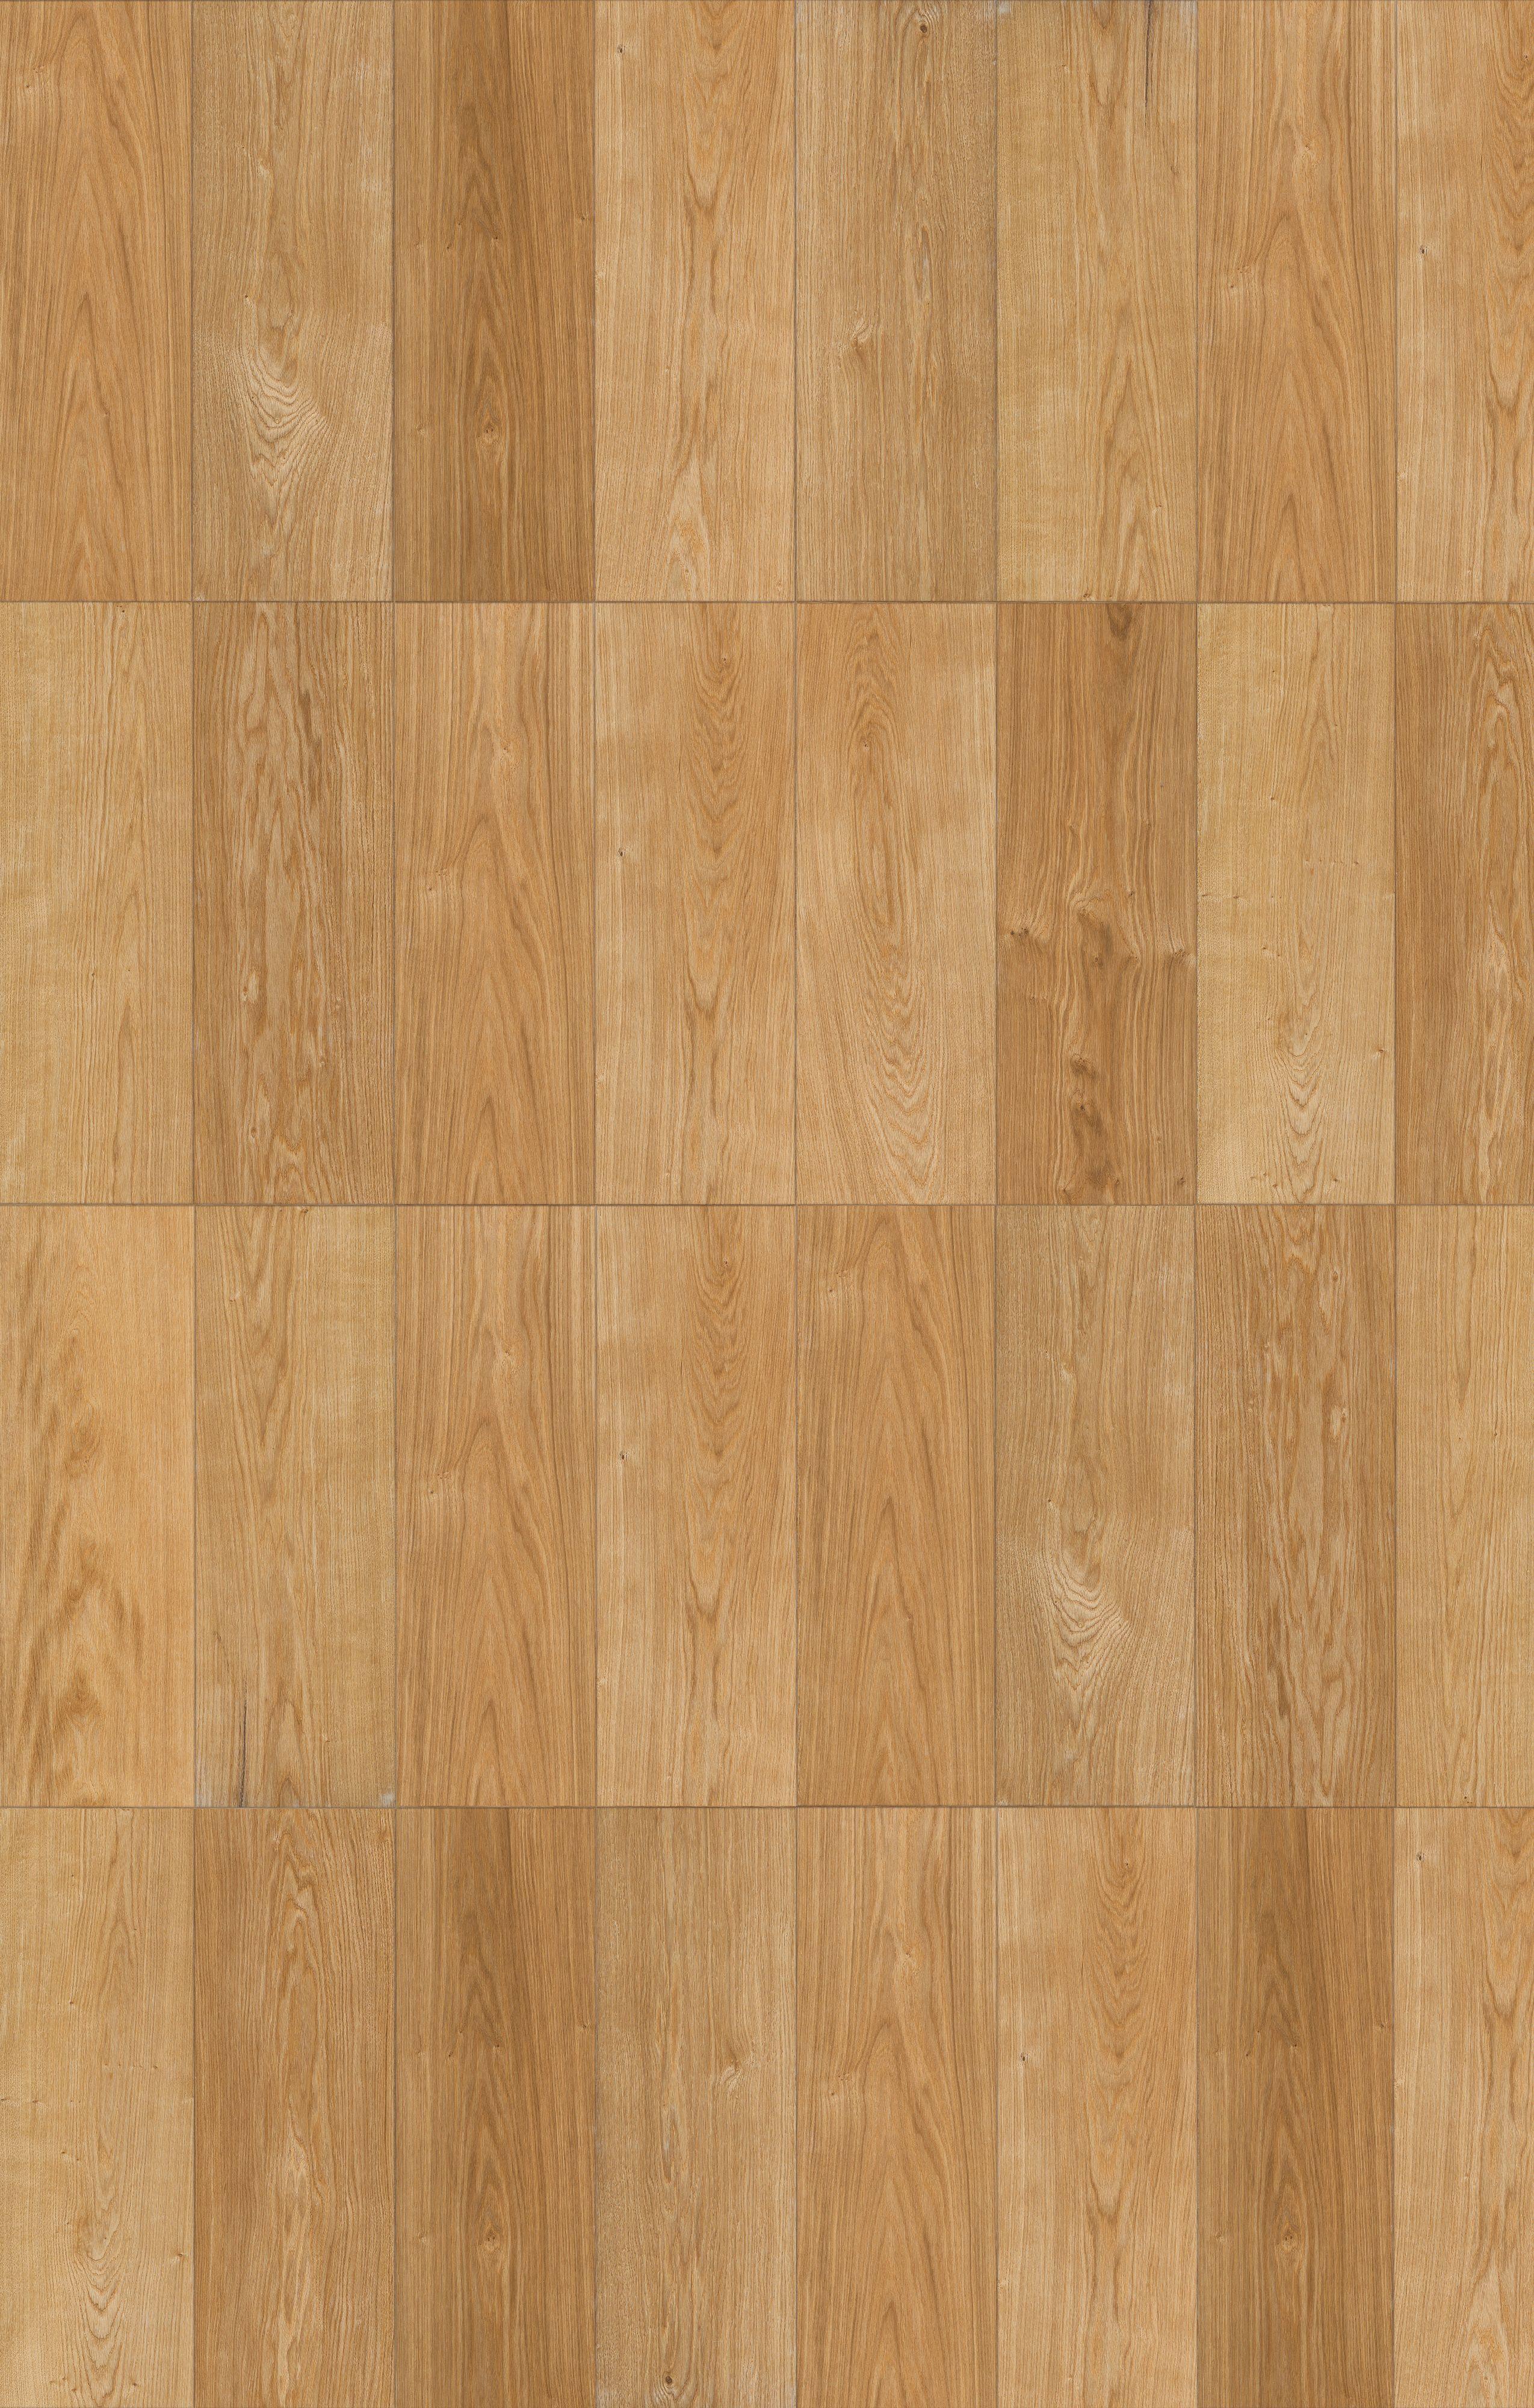 k hrs wood flooring parquet interior design www. Black Bedroom Furniture Sets. Home Design Ideas